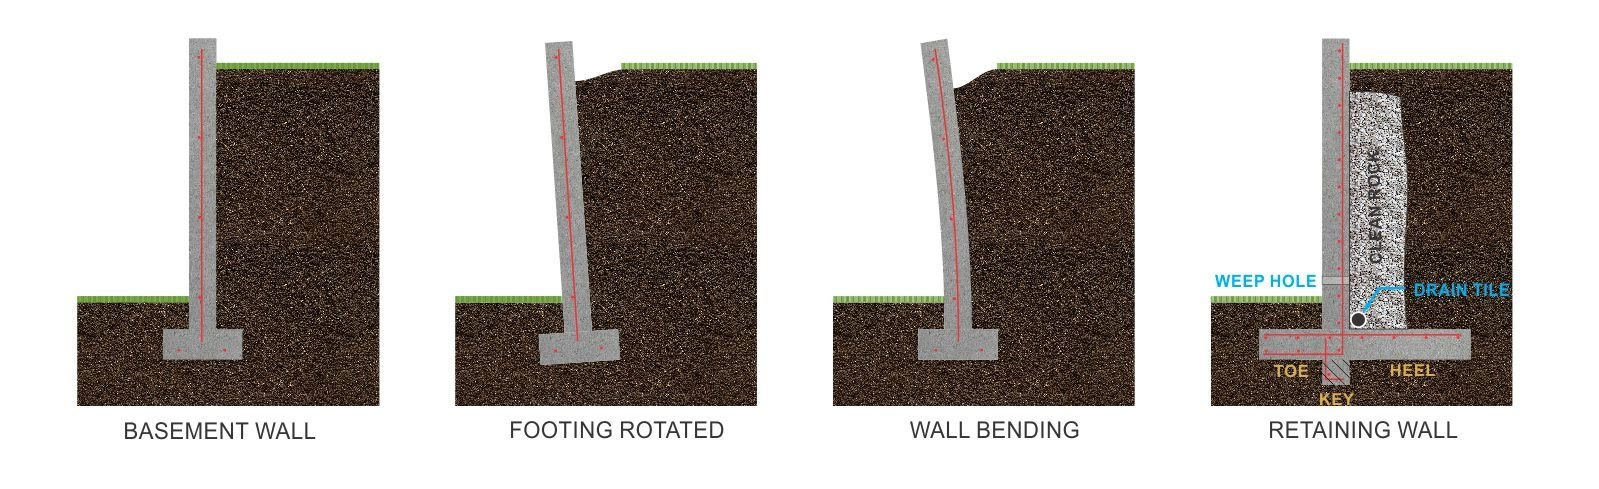 Retaining wall failure